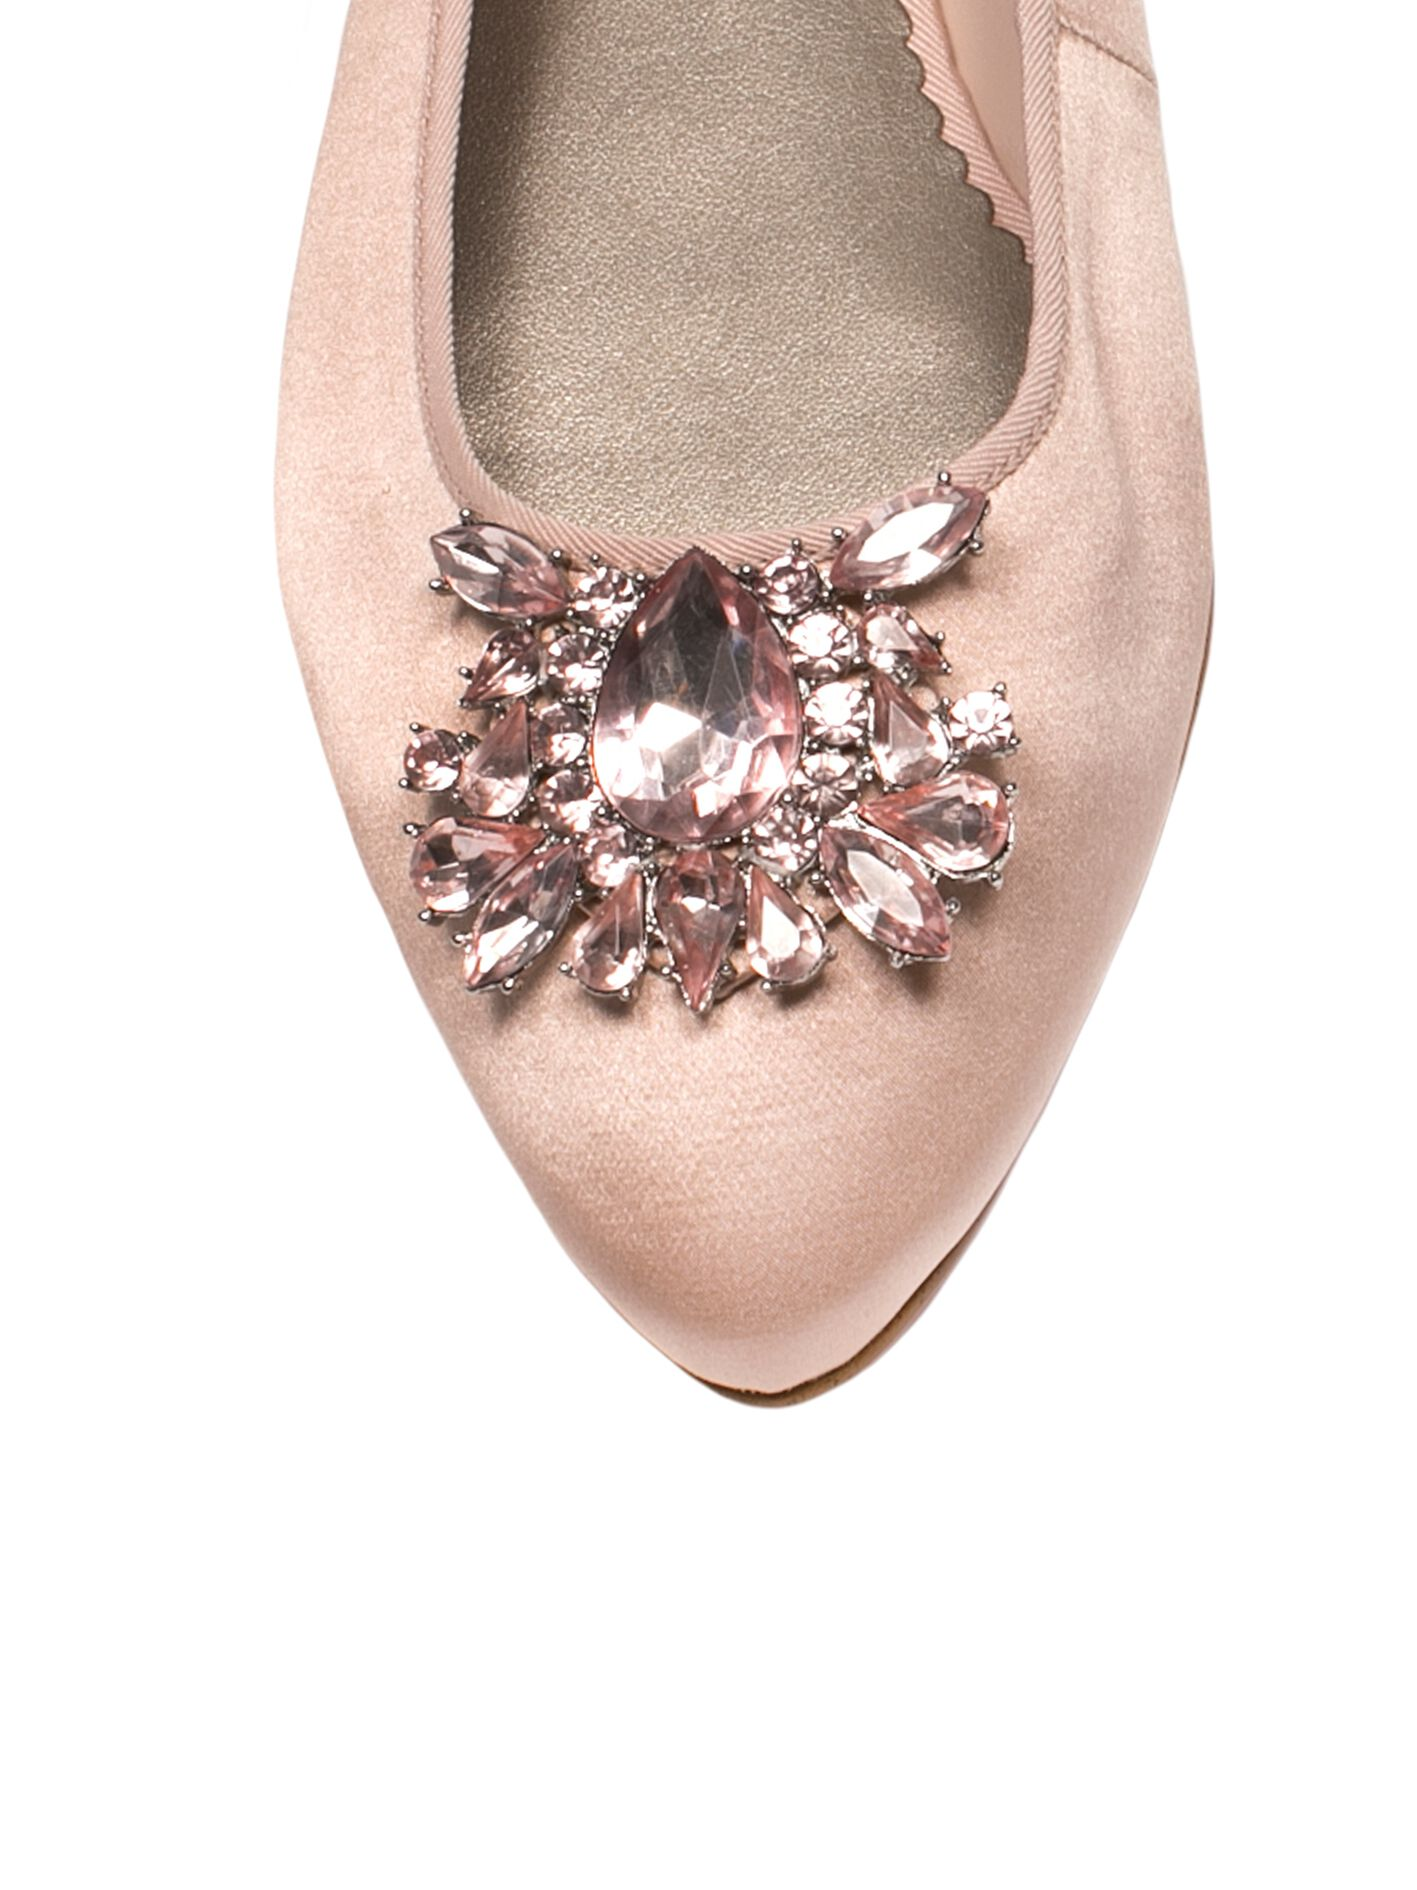 Darcy Ballerina Shoe